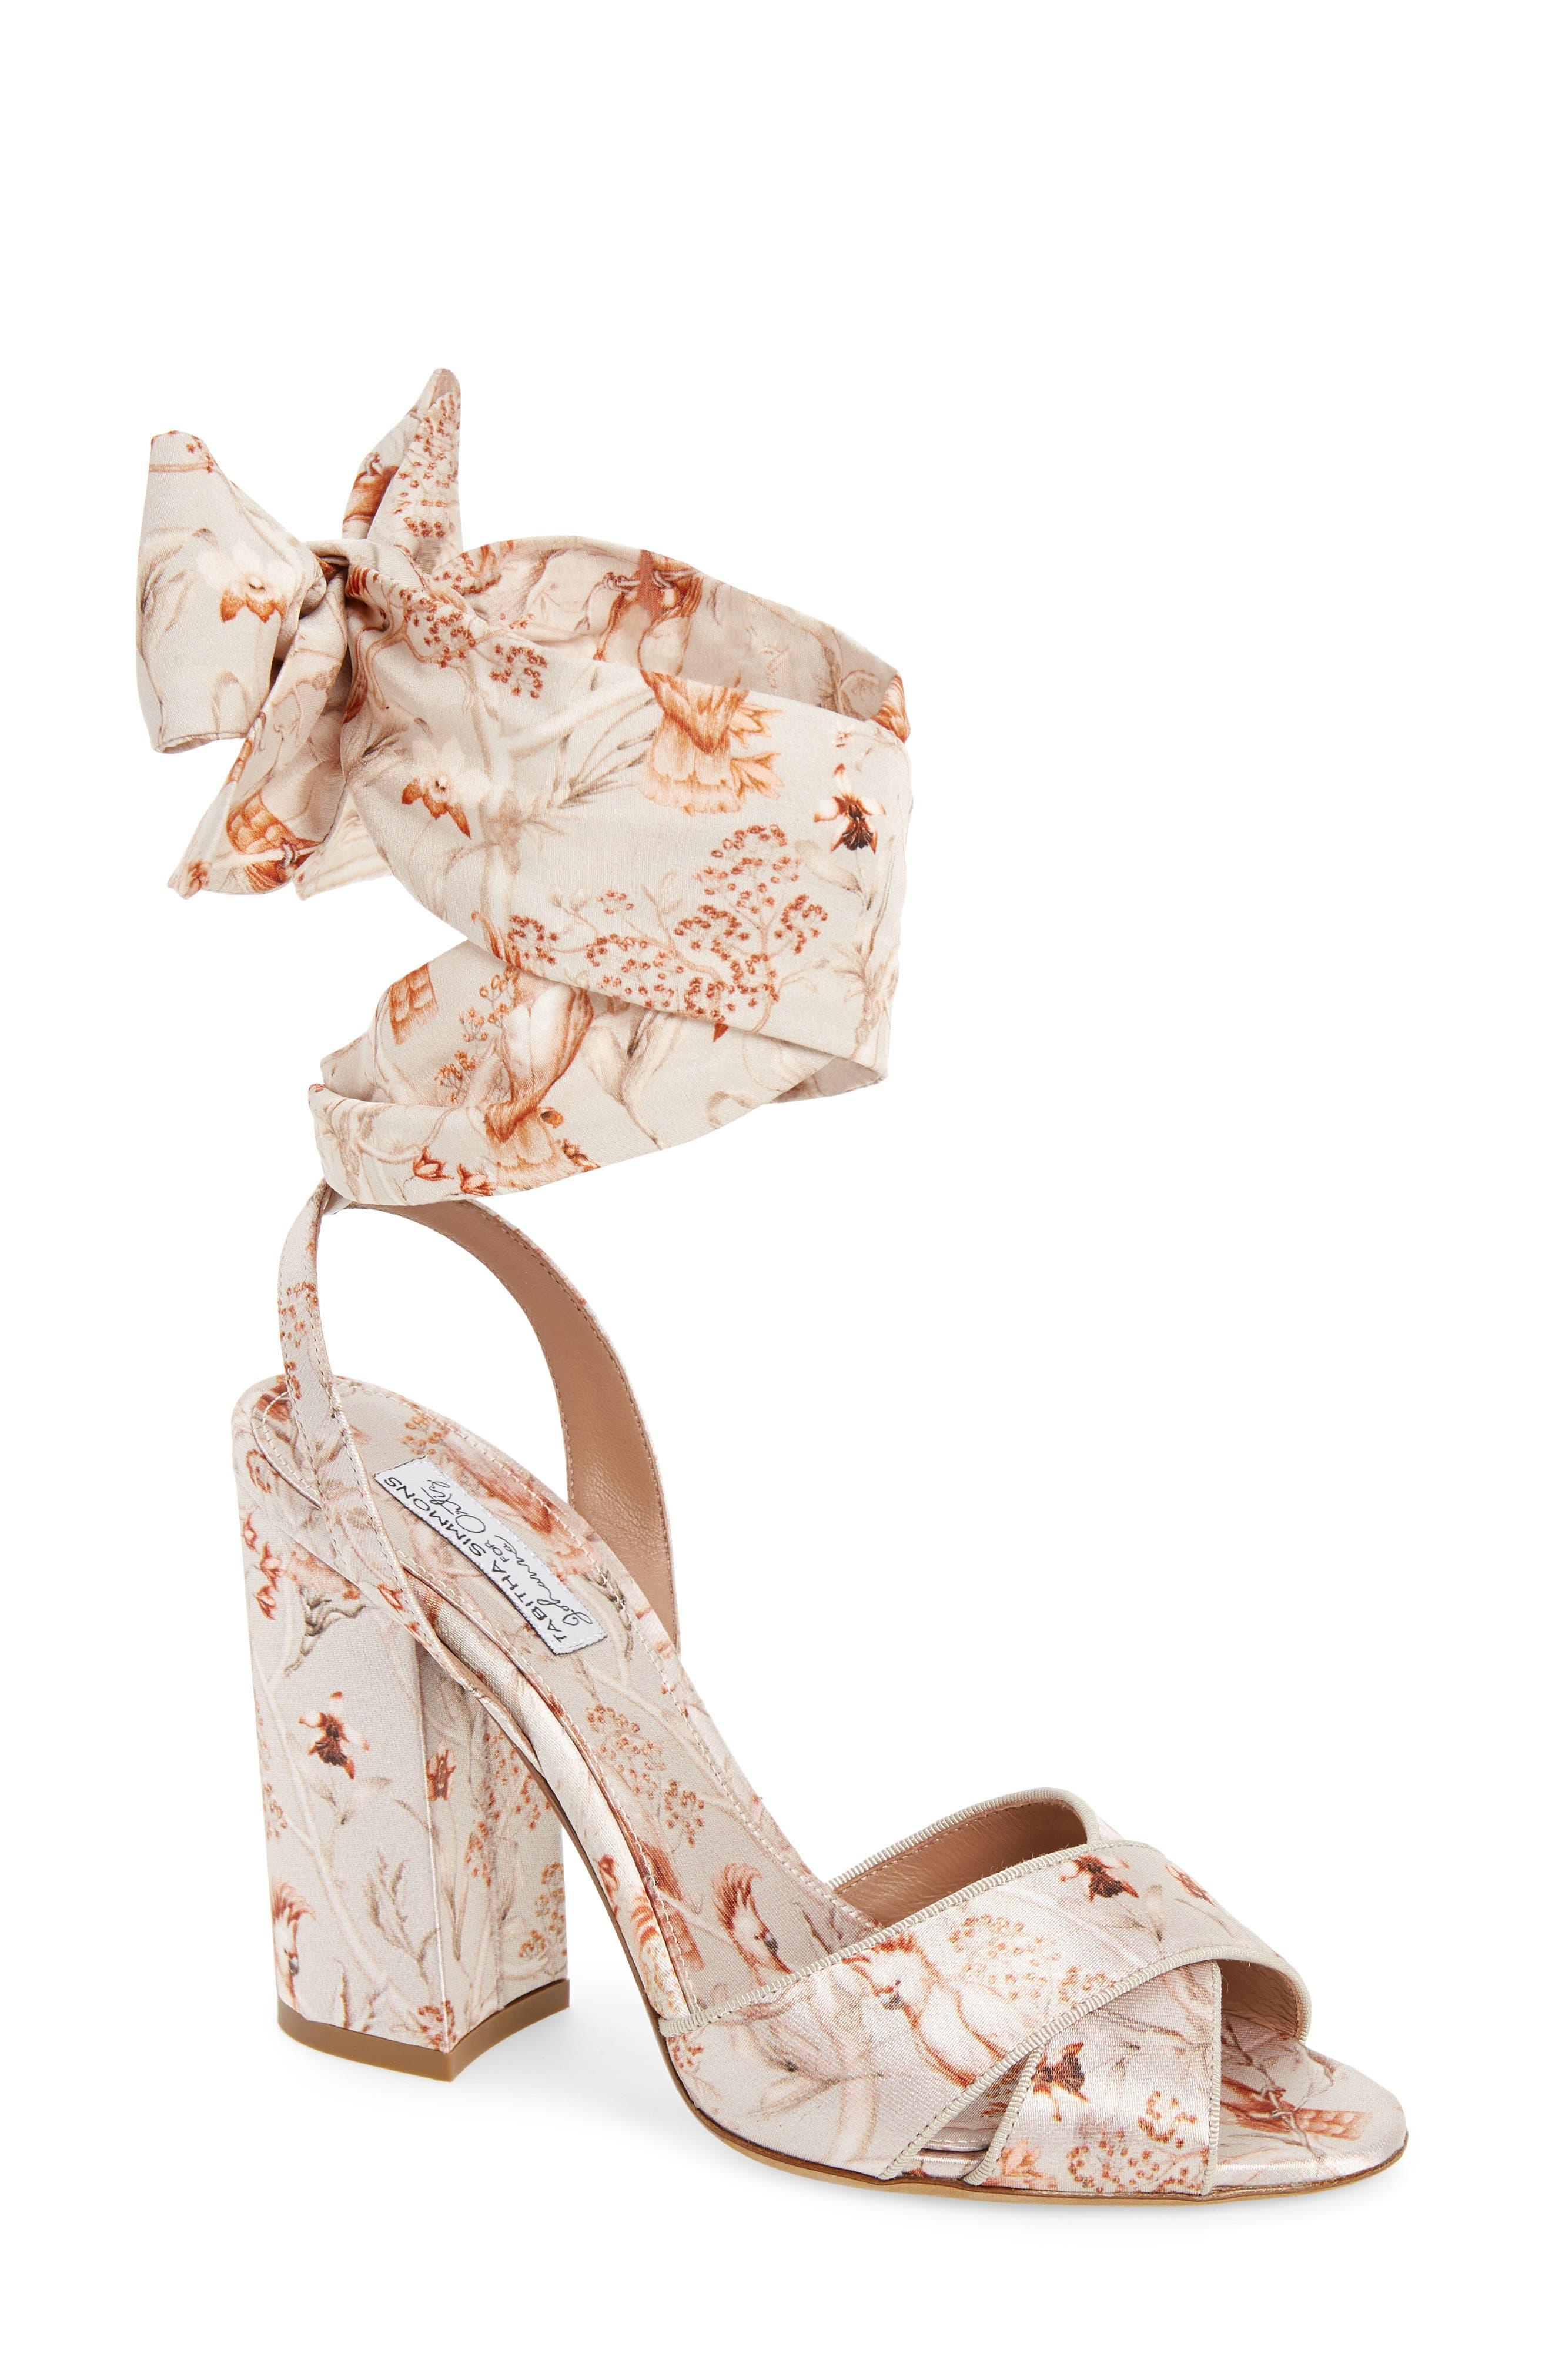 Tabitha Simmons Connie Wrap Lace-Up Sandal - Beige